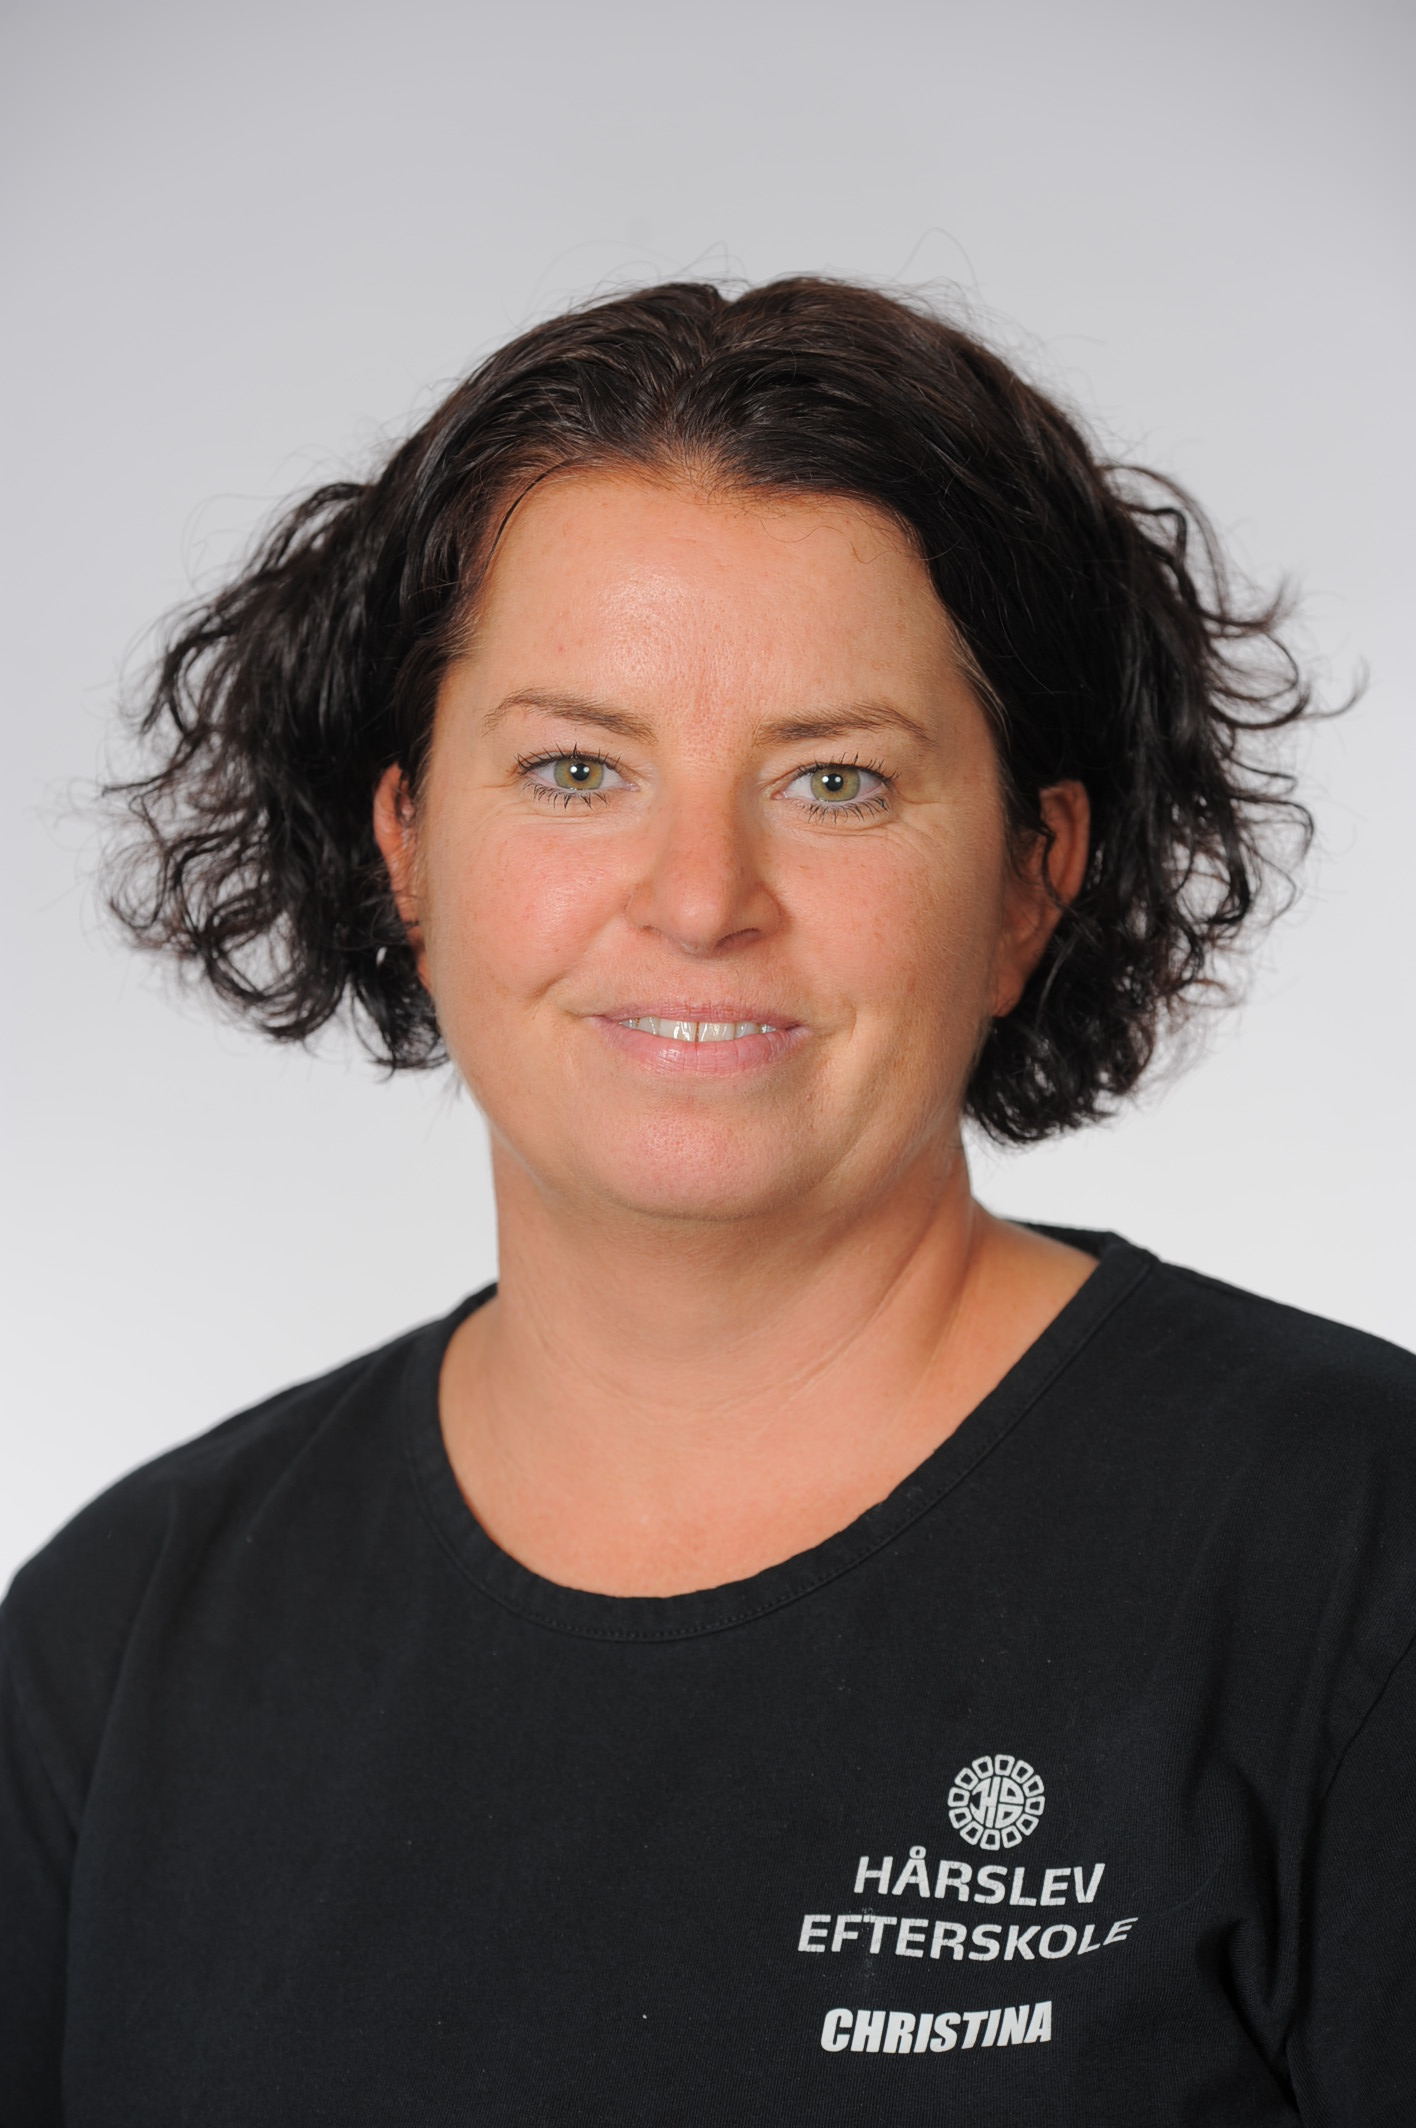 Christina Haulund